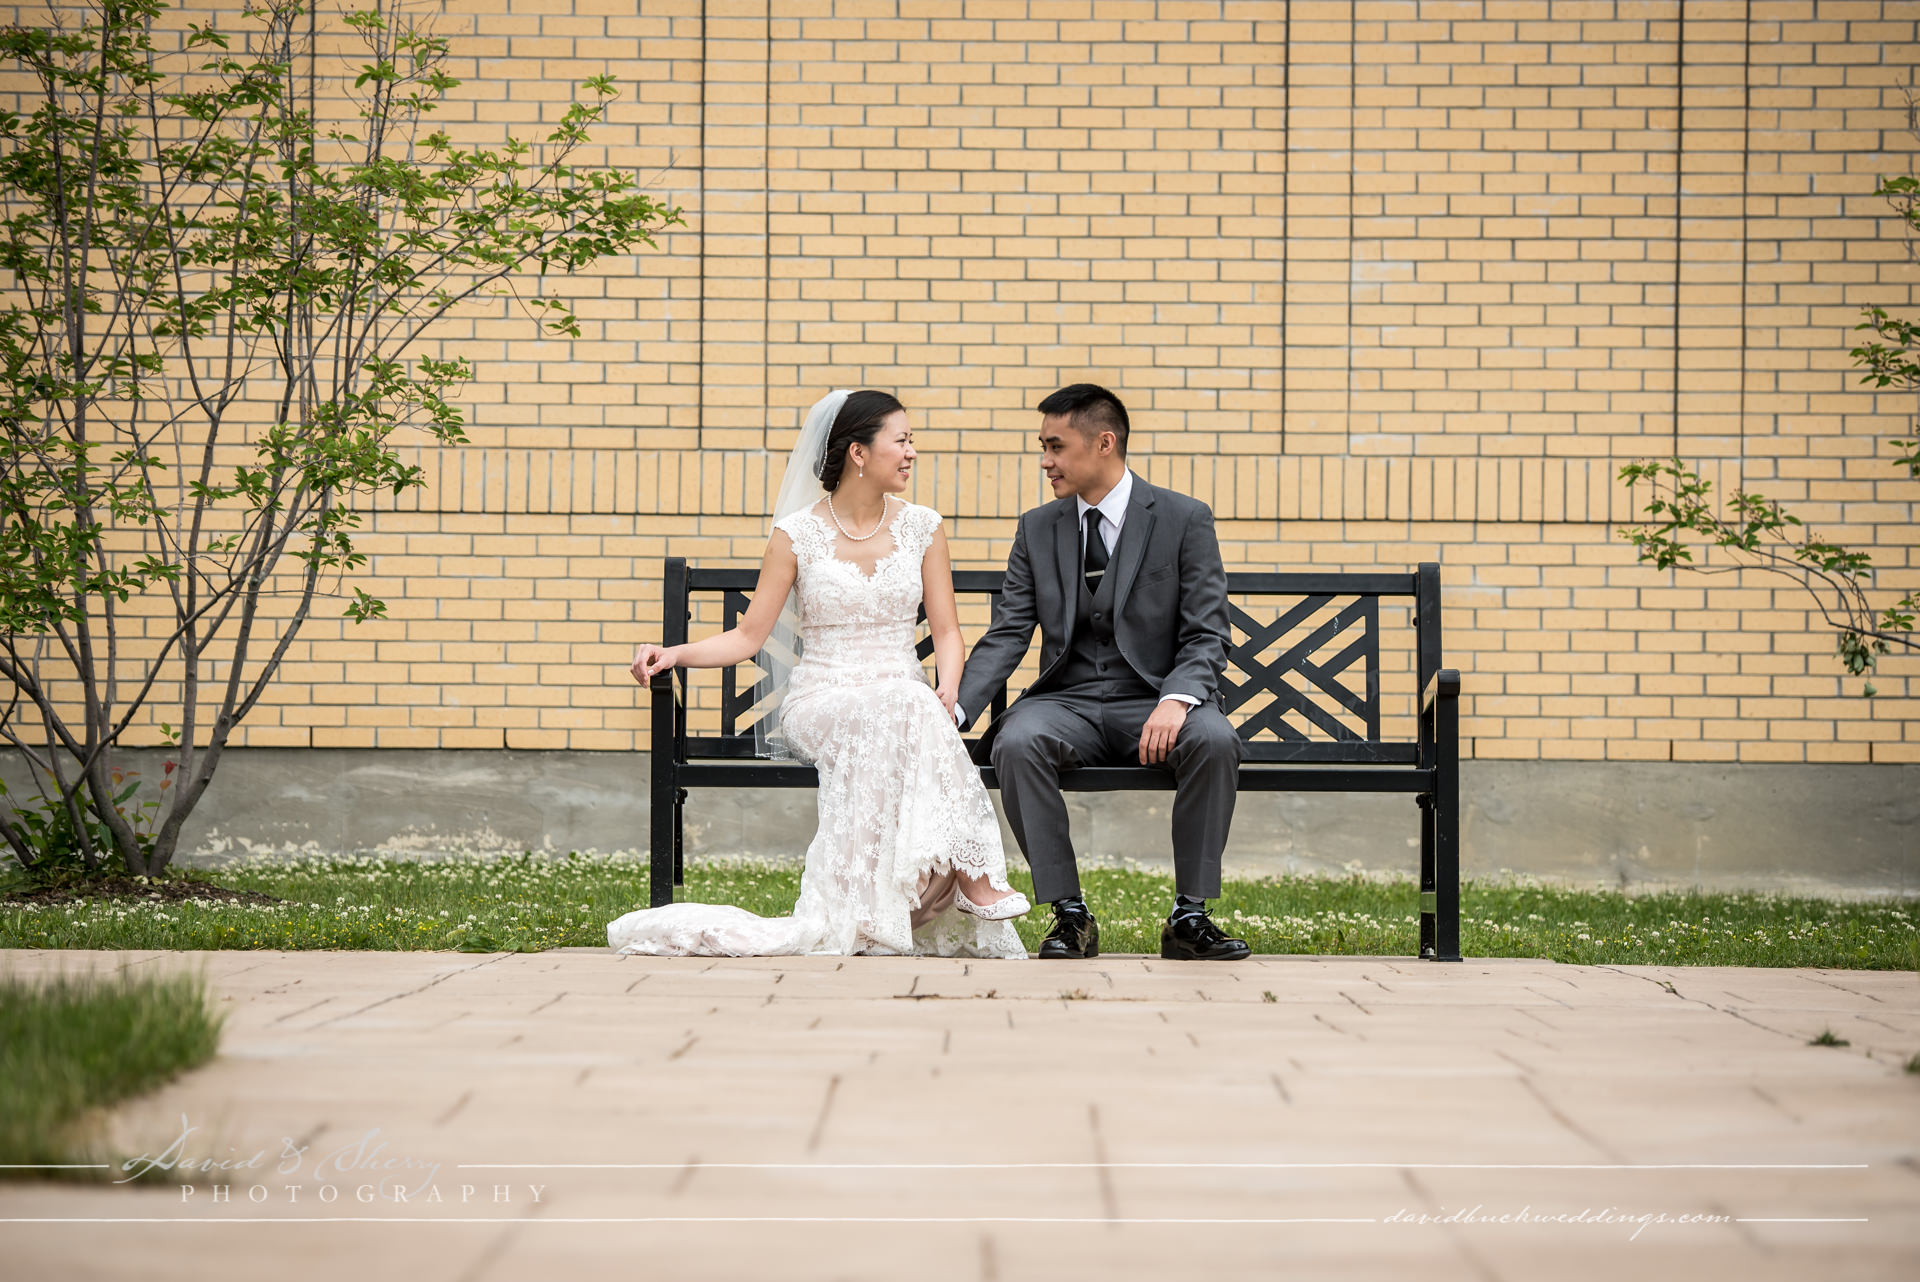 Liberty_Grand_Wedding_Photography_006